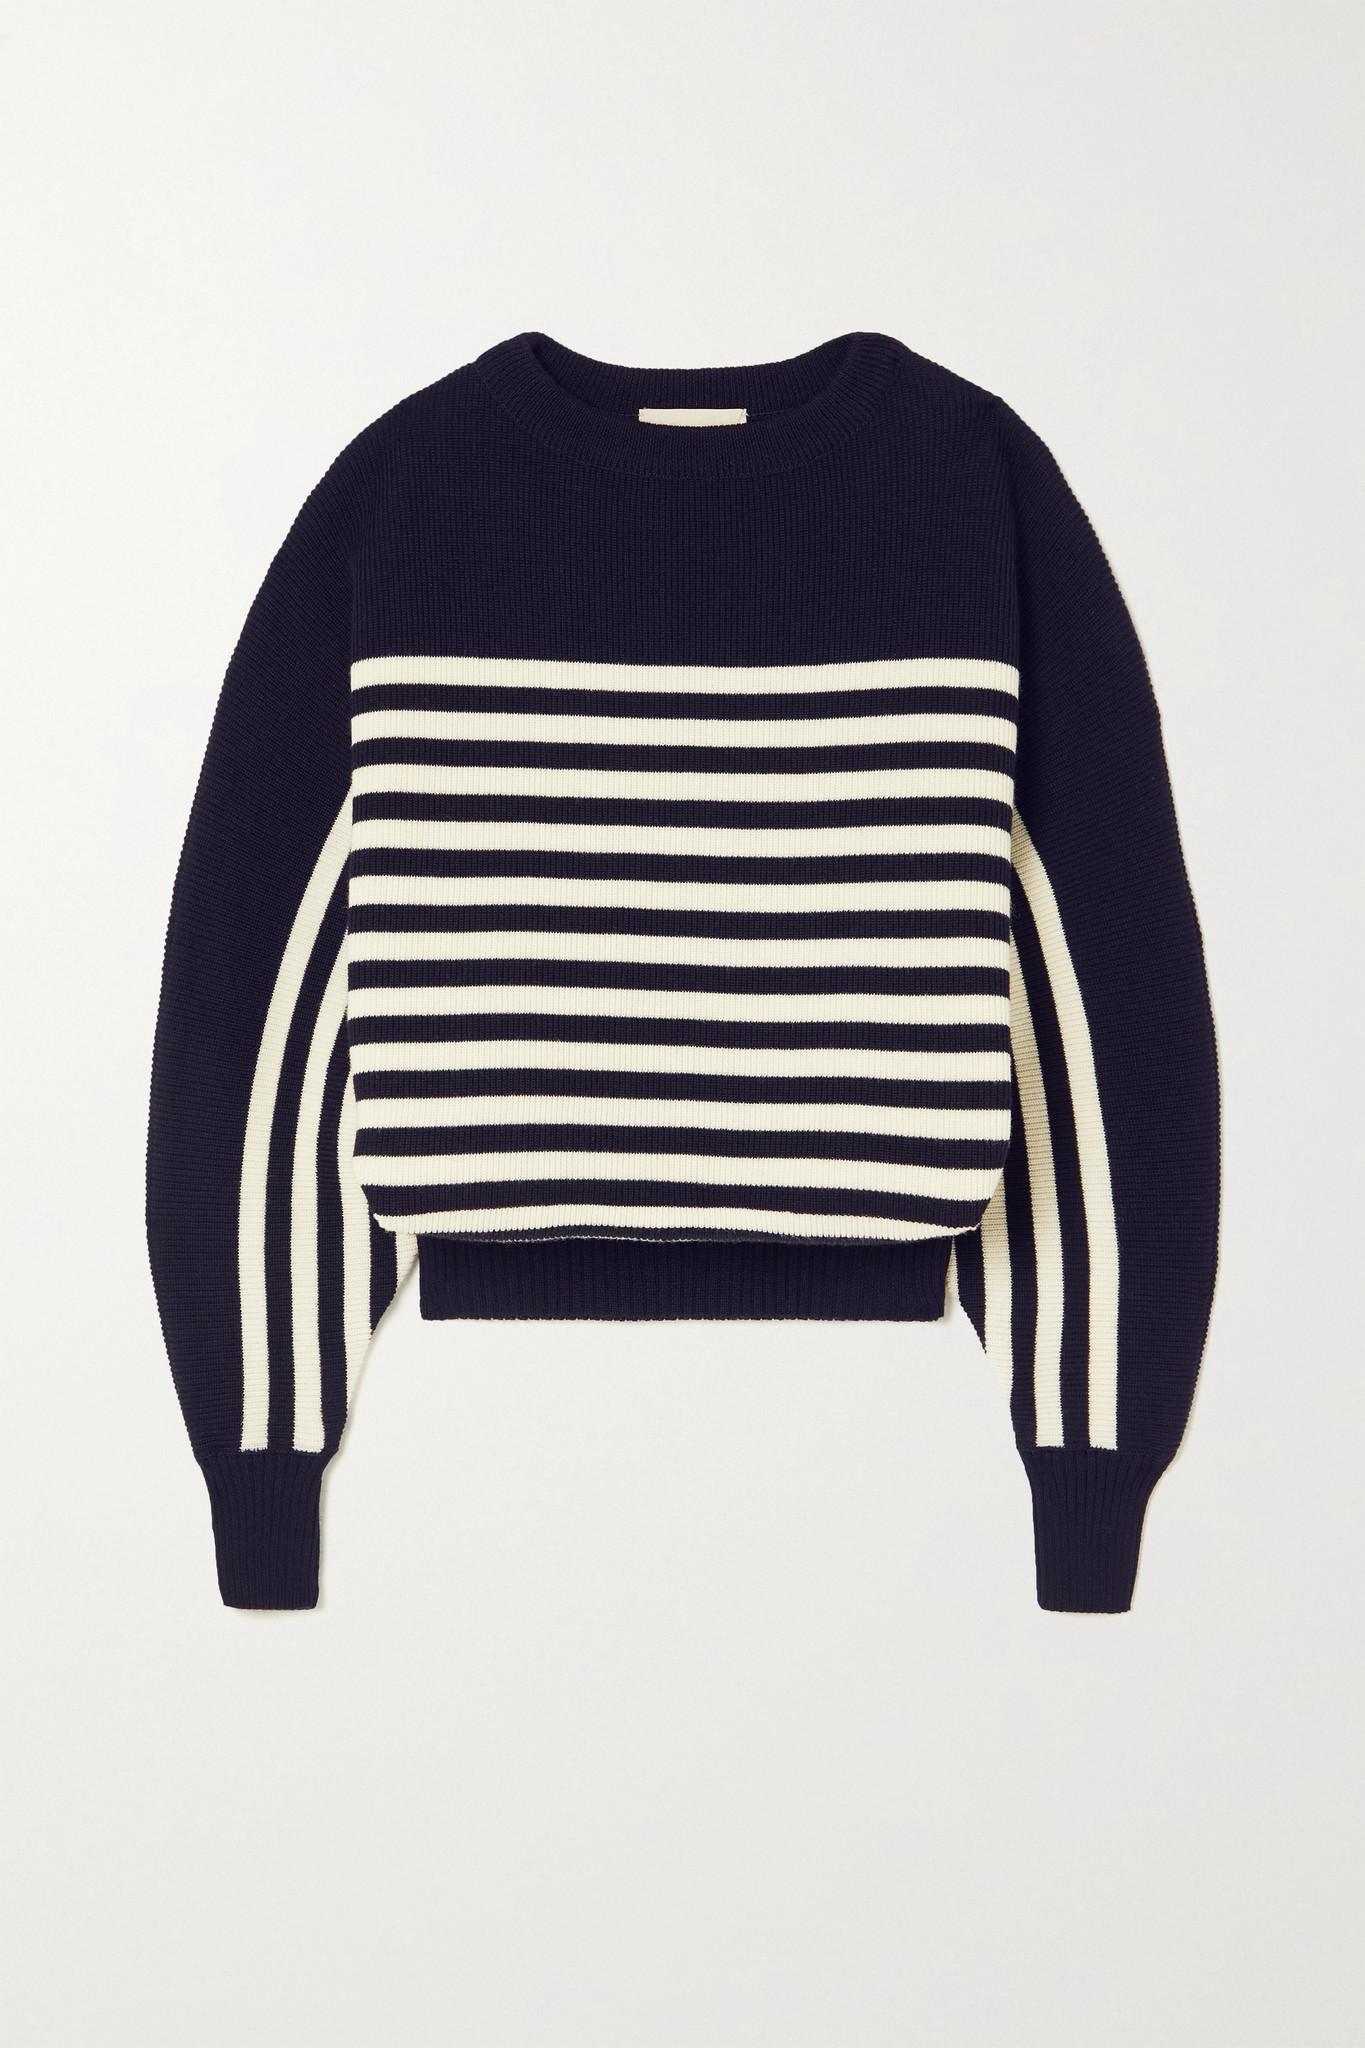 ALEXANDRE VAUTHIER - Striped Wool Sweater - Blue - medium